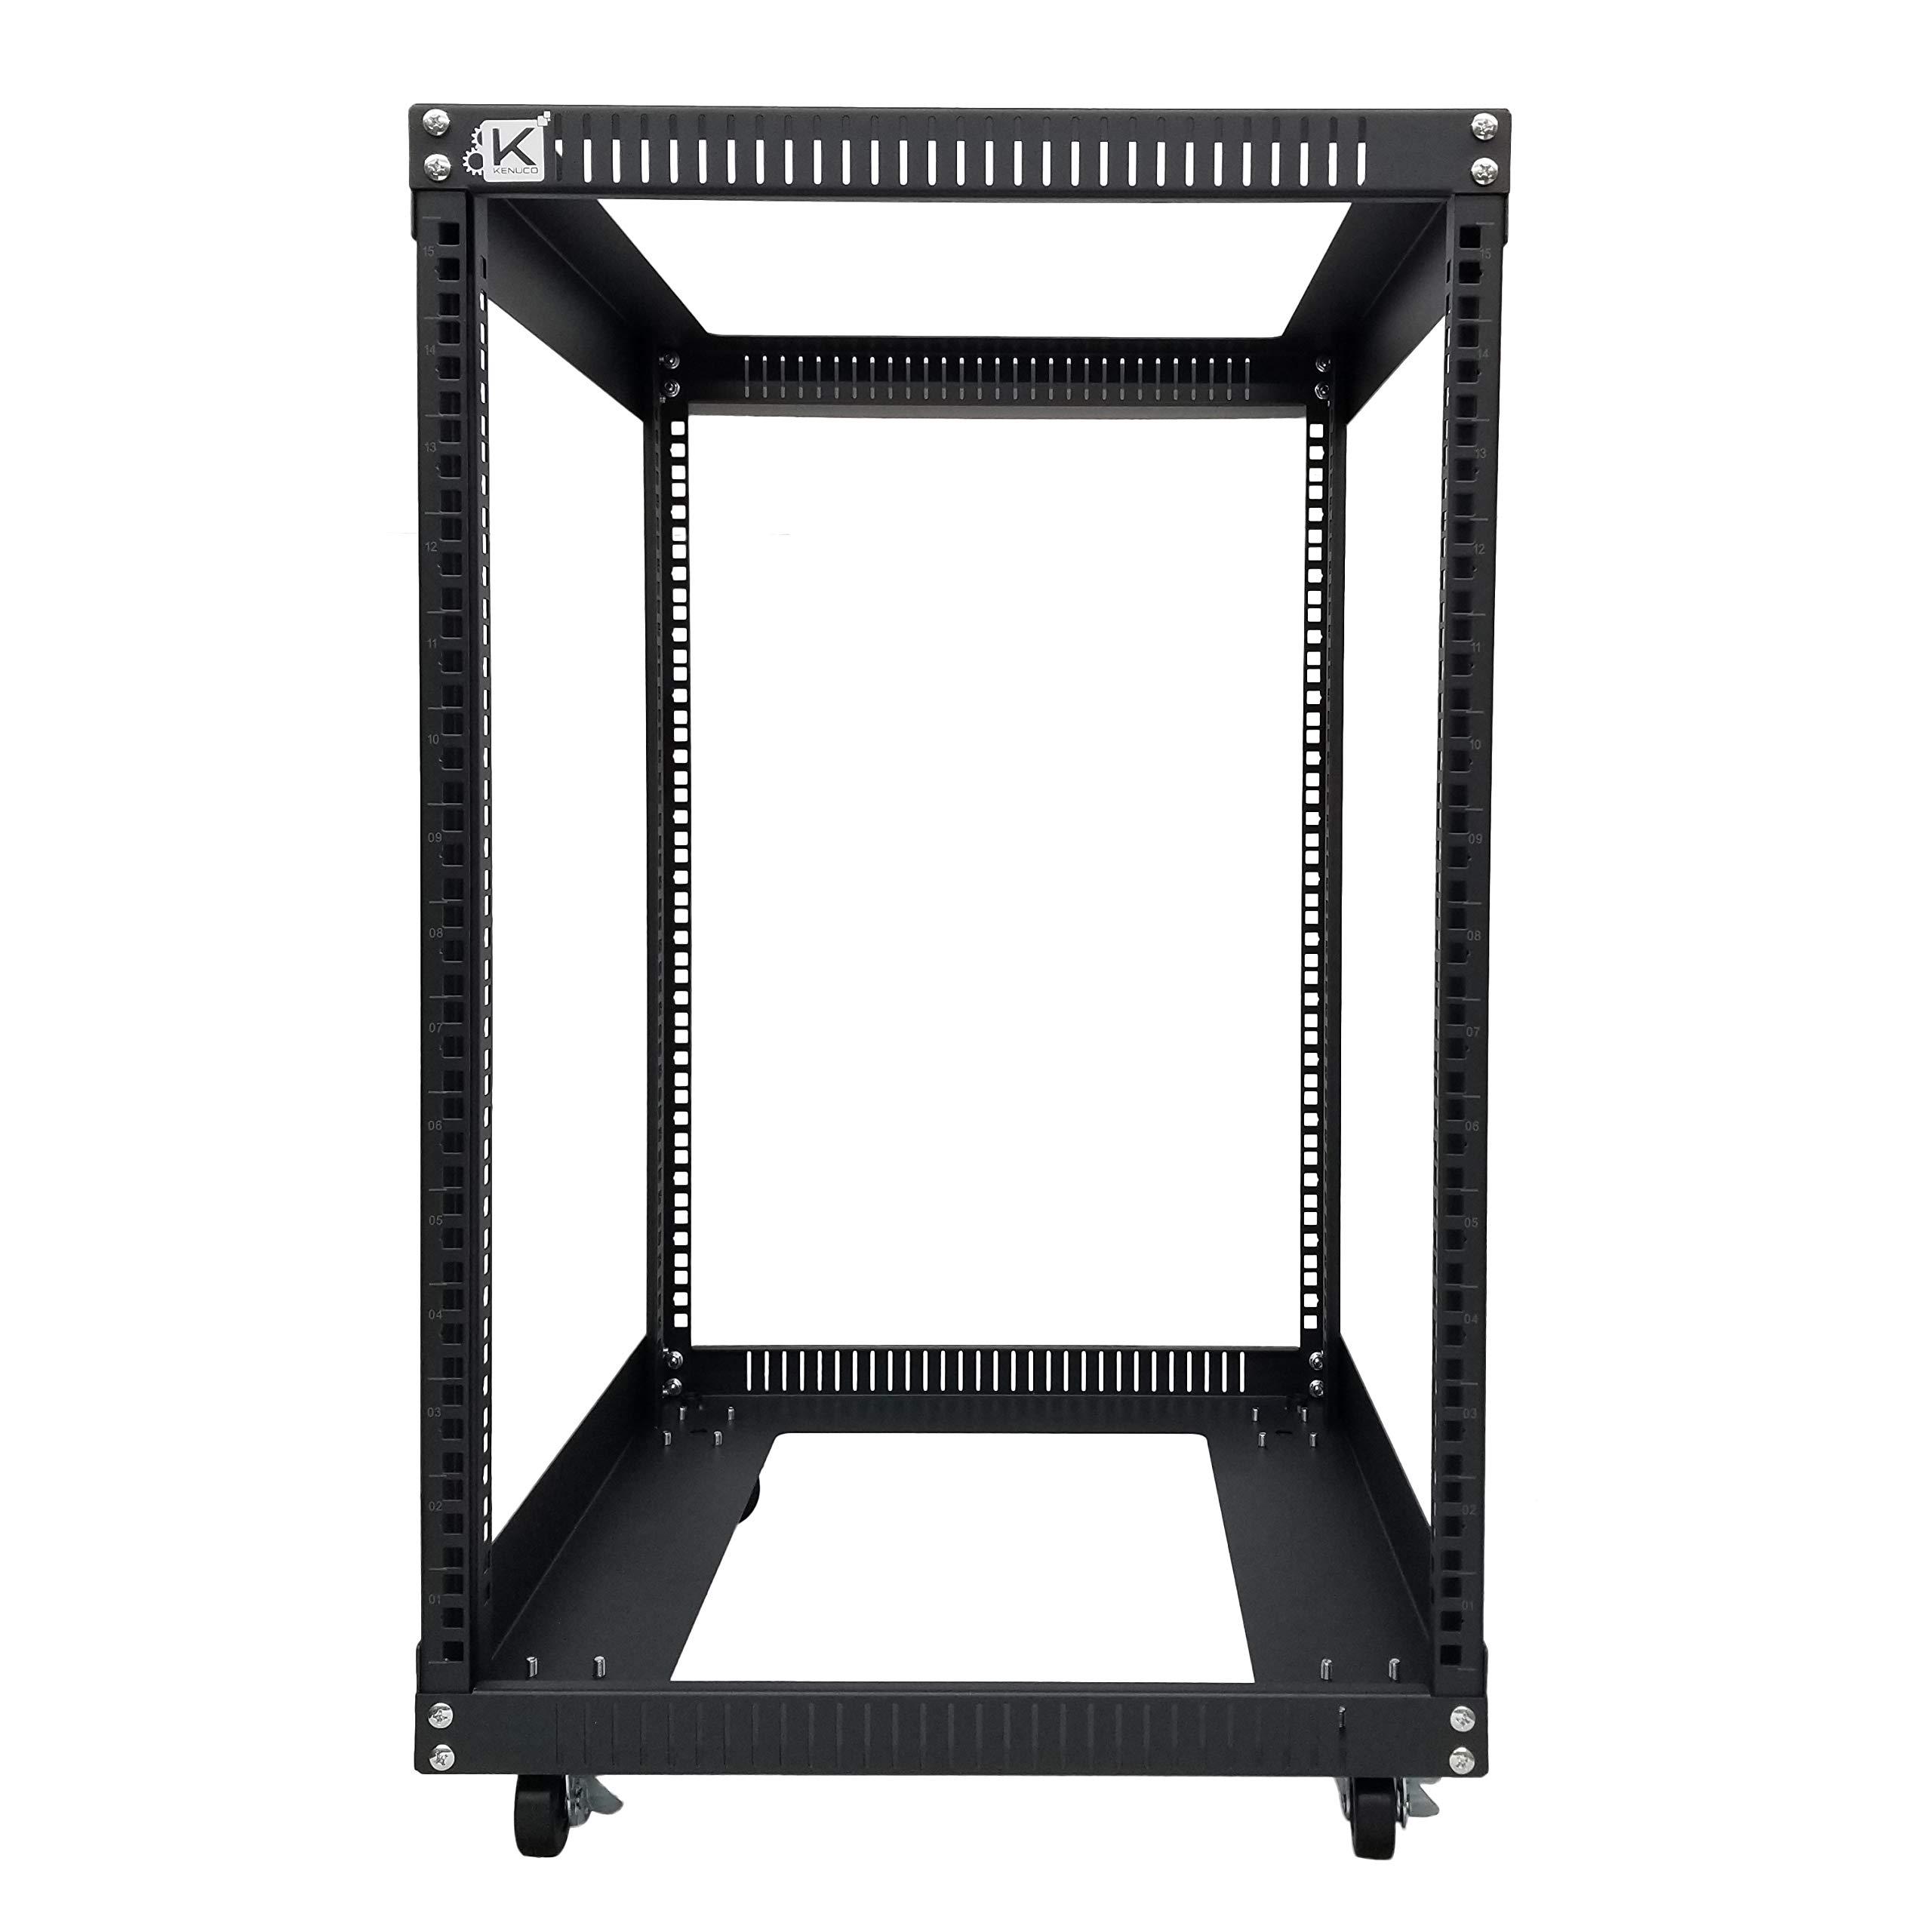 Kenuco 15U Standing Open Frame Rack with 4 Wheels and 4 Posts - Steel Network Equipment Rack 17.75 Inch Deep